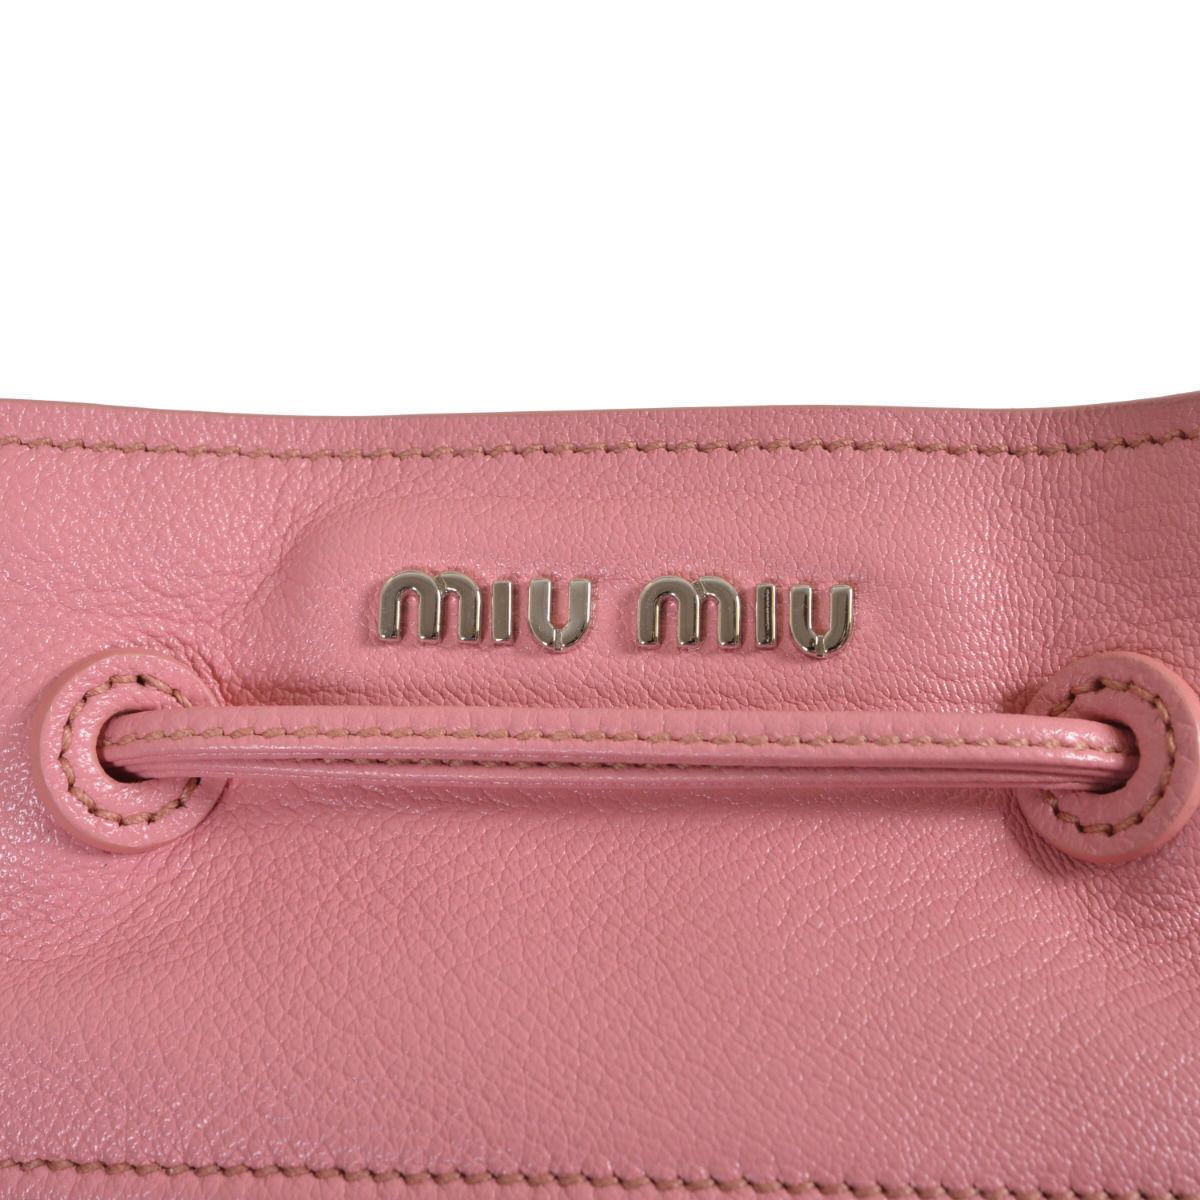 Miu Miu Women's Two Tone Leather Bucket Handbag Shoulder Bag 6